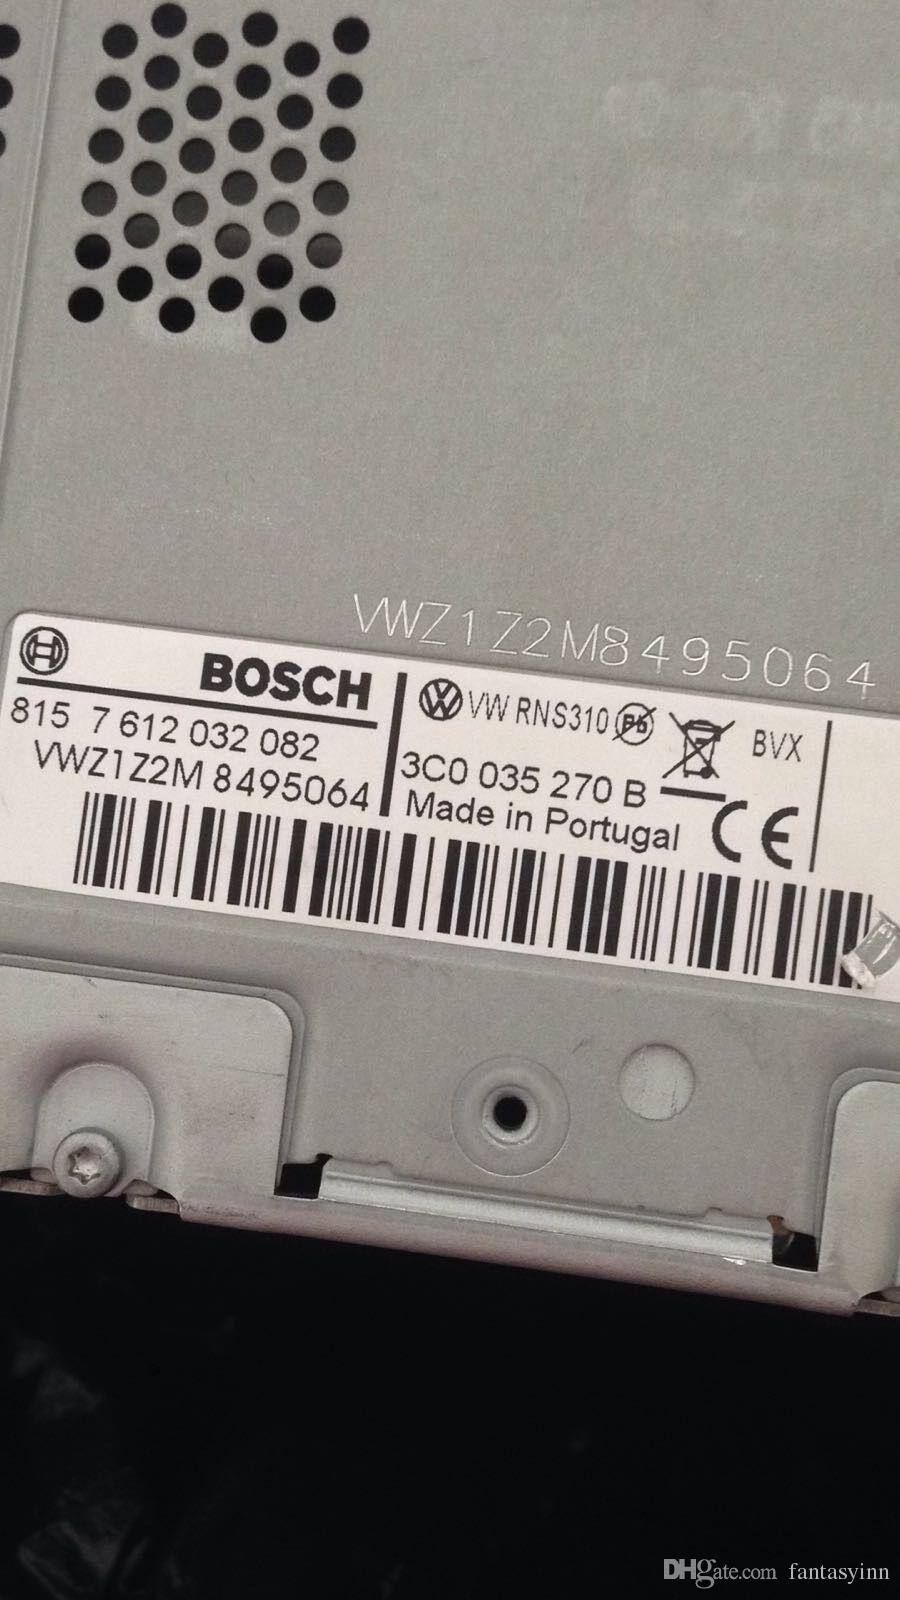 Sblocca Decode Servizio Volkswagen VW autoradio navigazione sblocco Decode Servizio FIT VW RNS310 RNS315